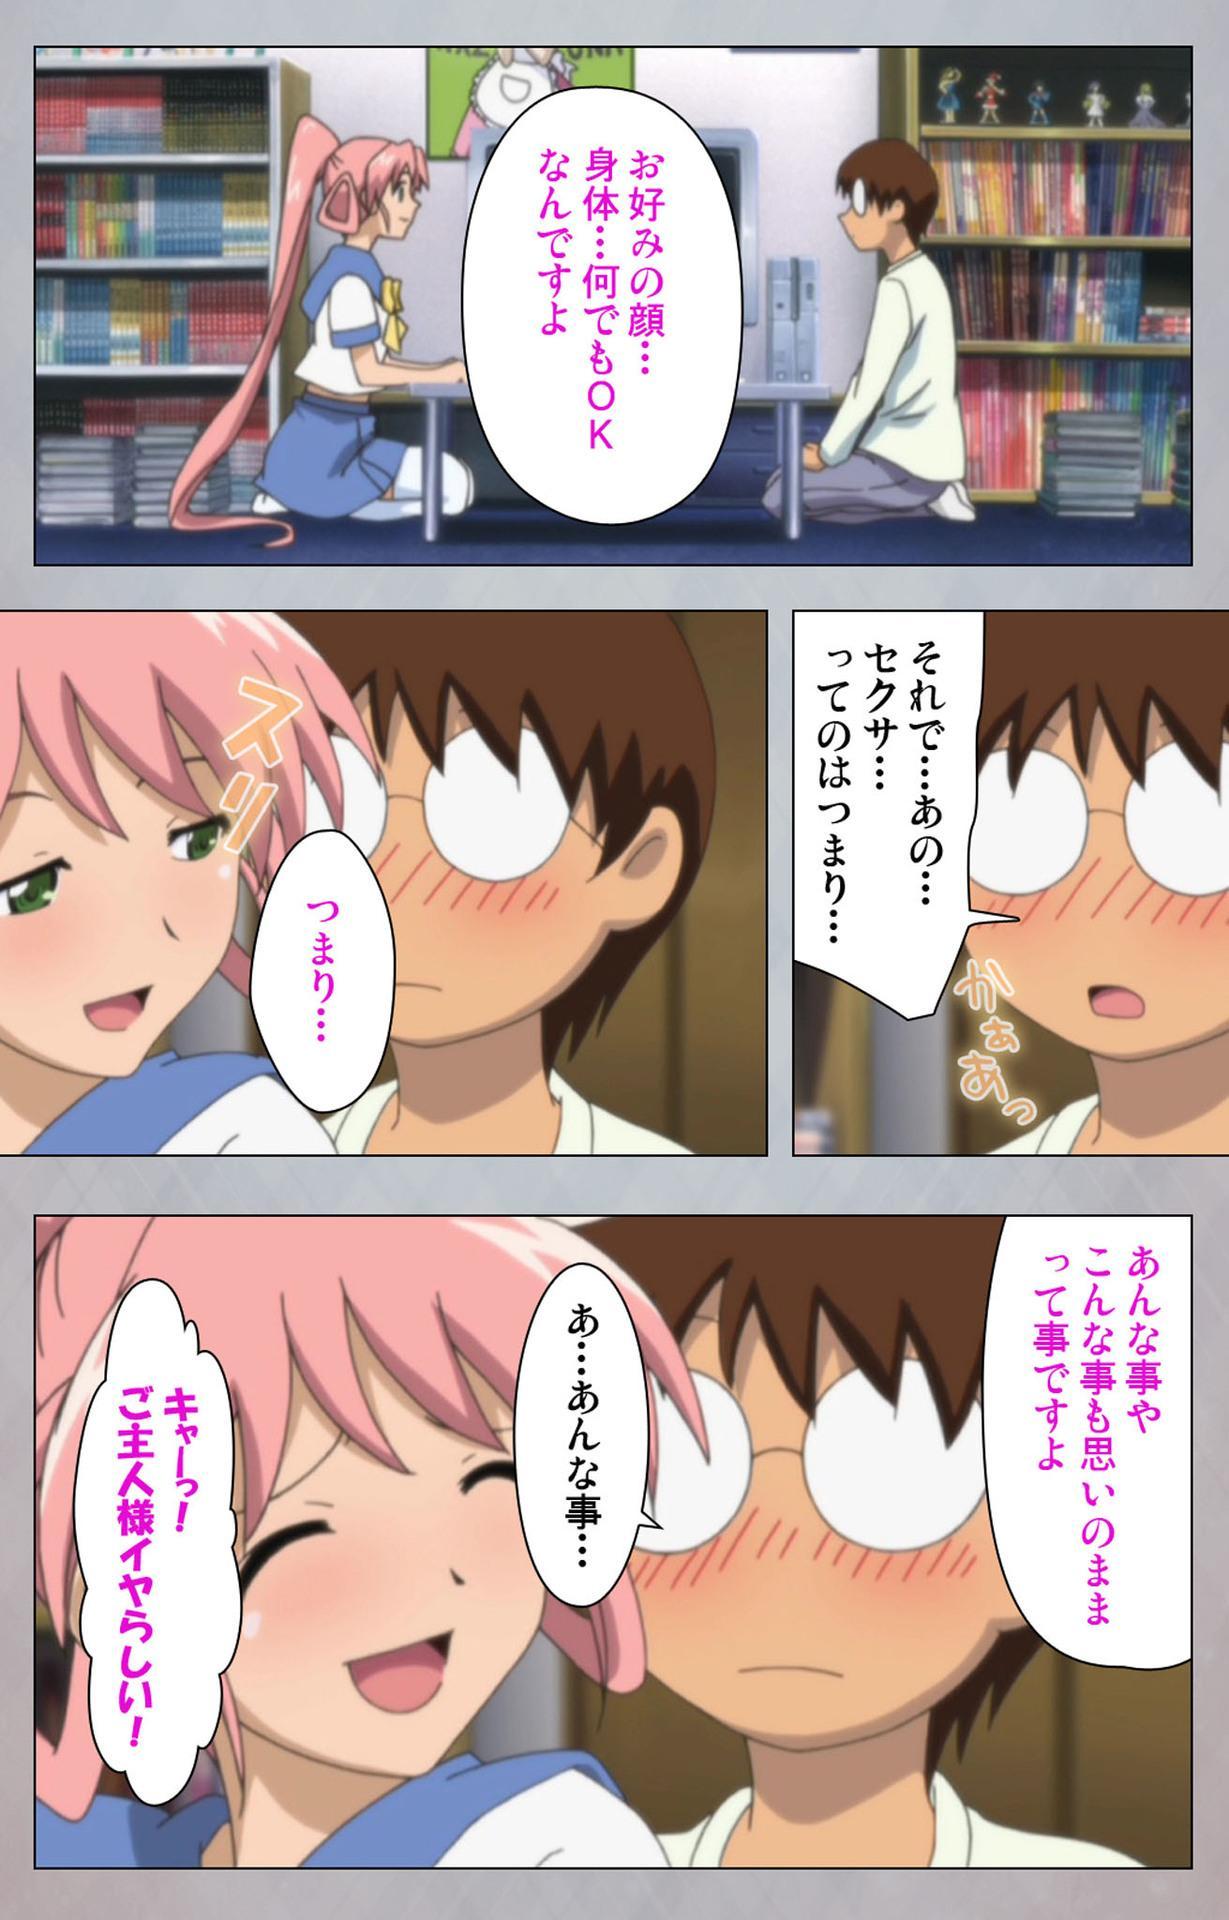 [Digital Works] [Full Color Seijin Ban] Sex Android ~Risou no Onna de Nuite yaru~ Kanzenban 37